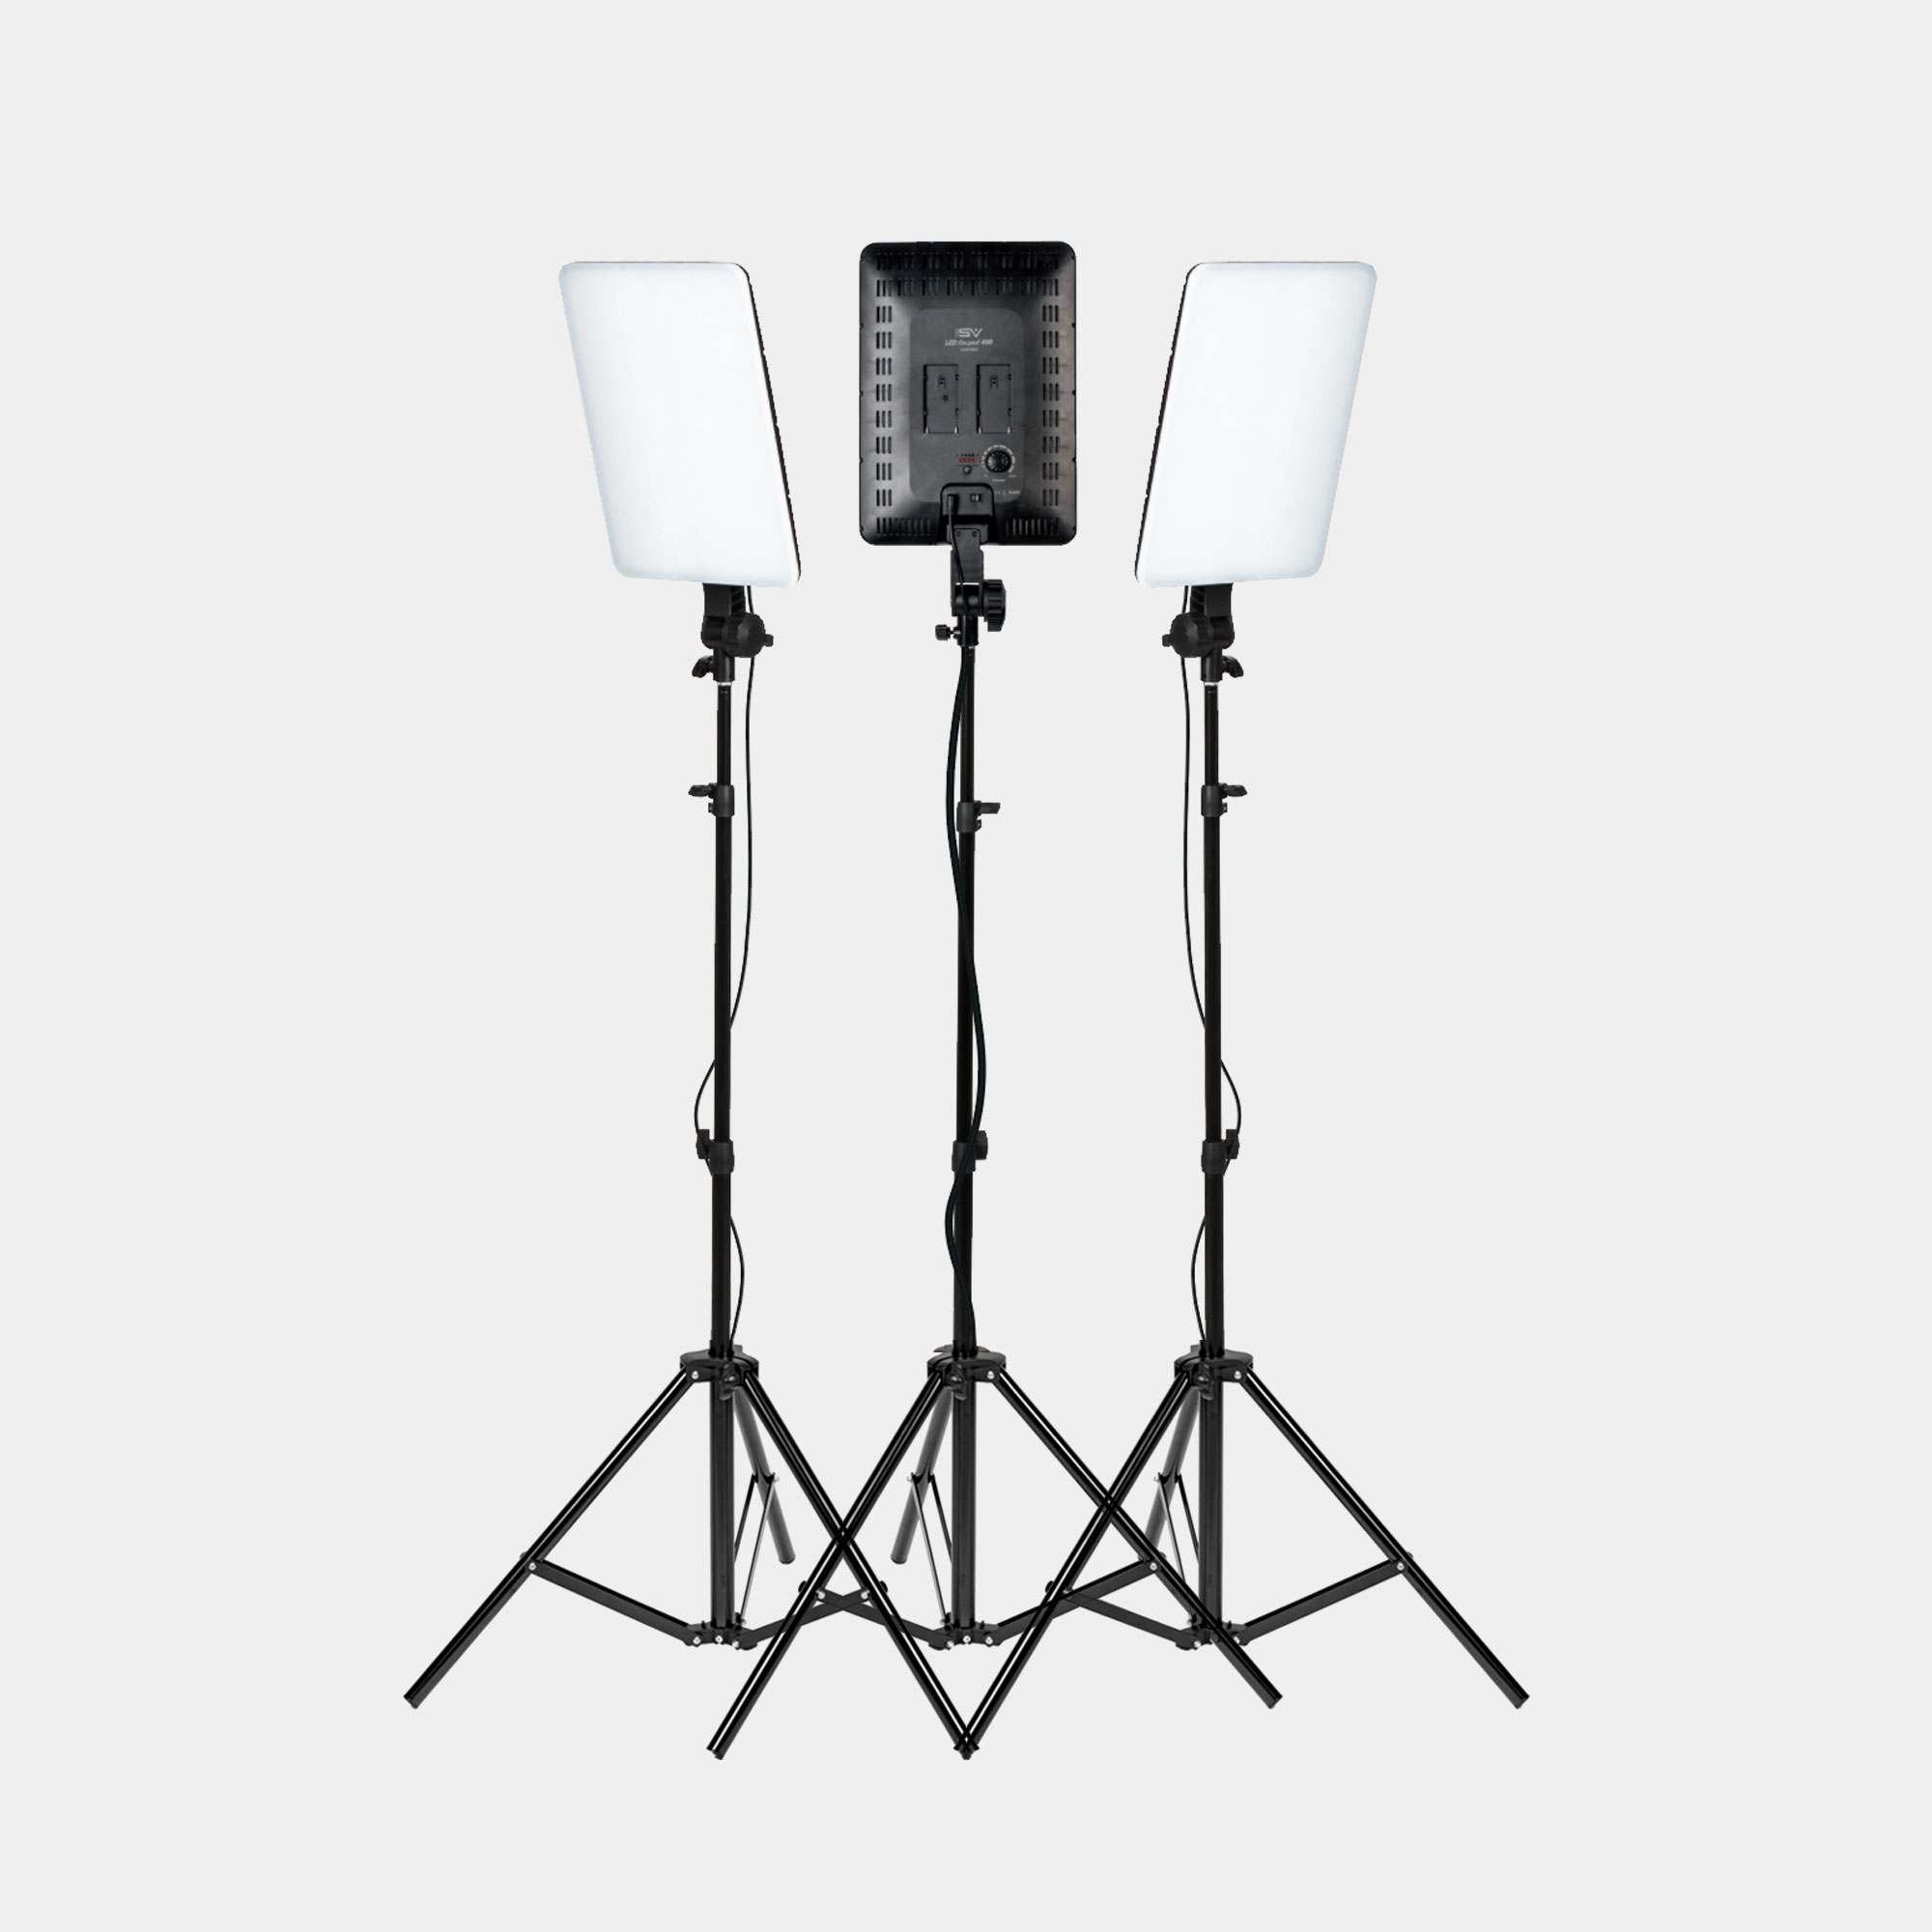 Smith Victor Slim Panel Led 3 Light Kit